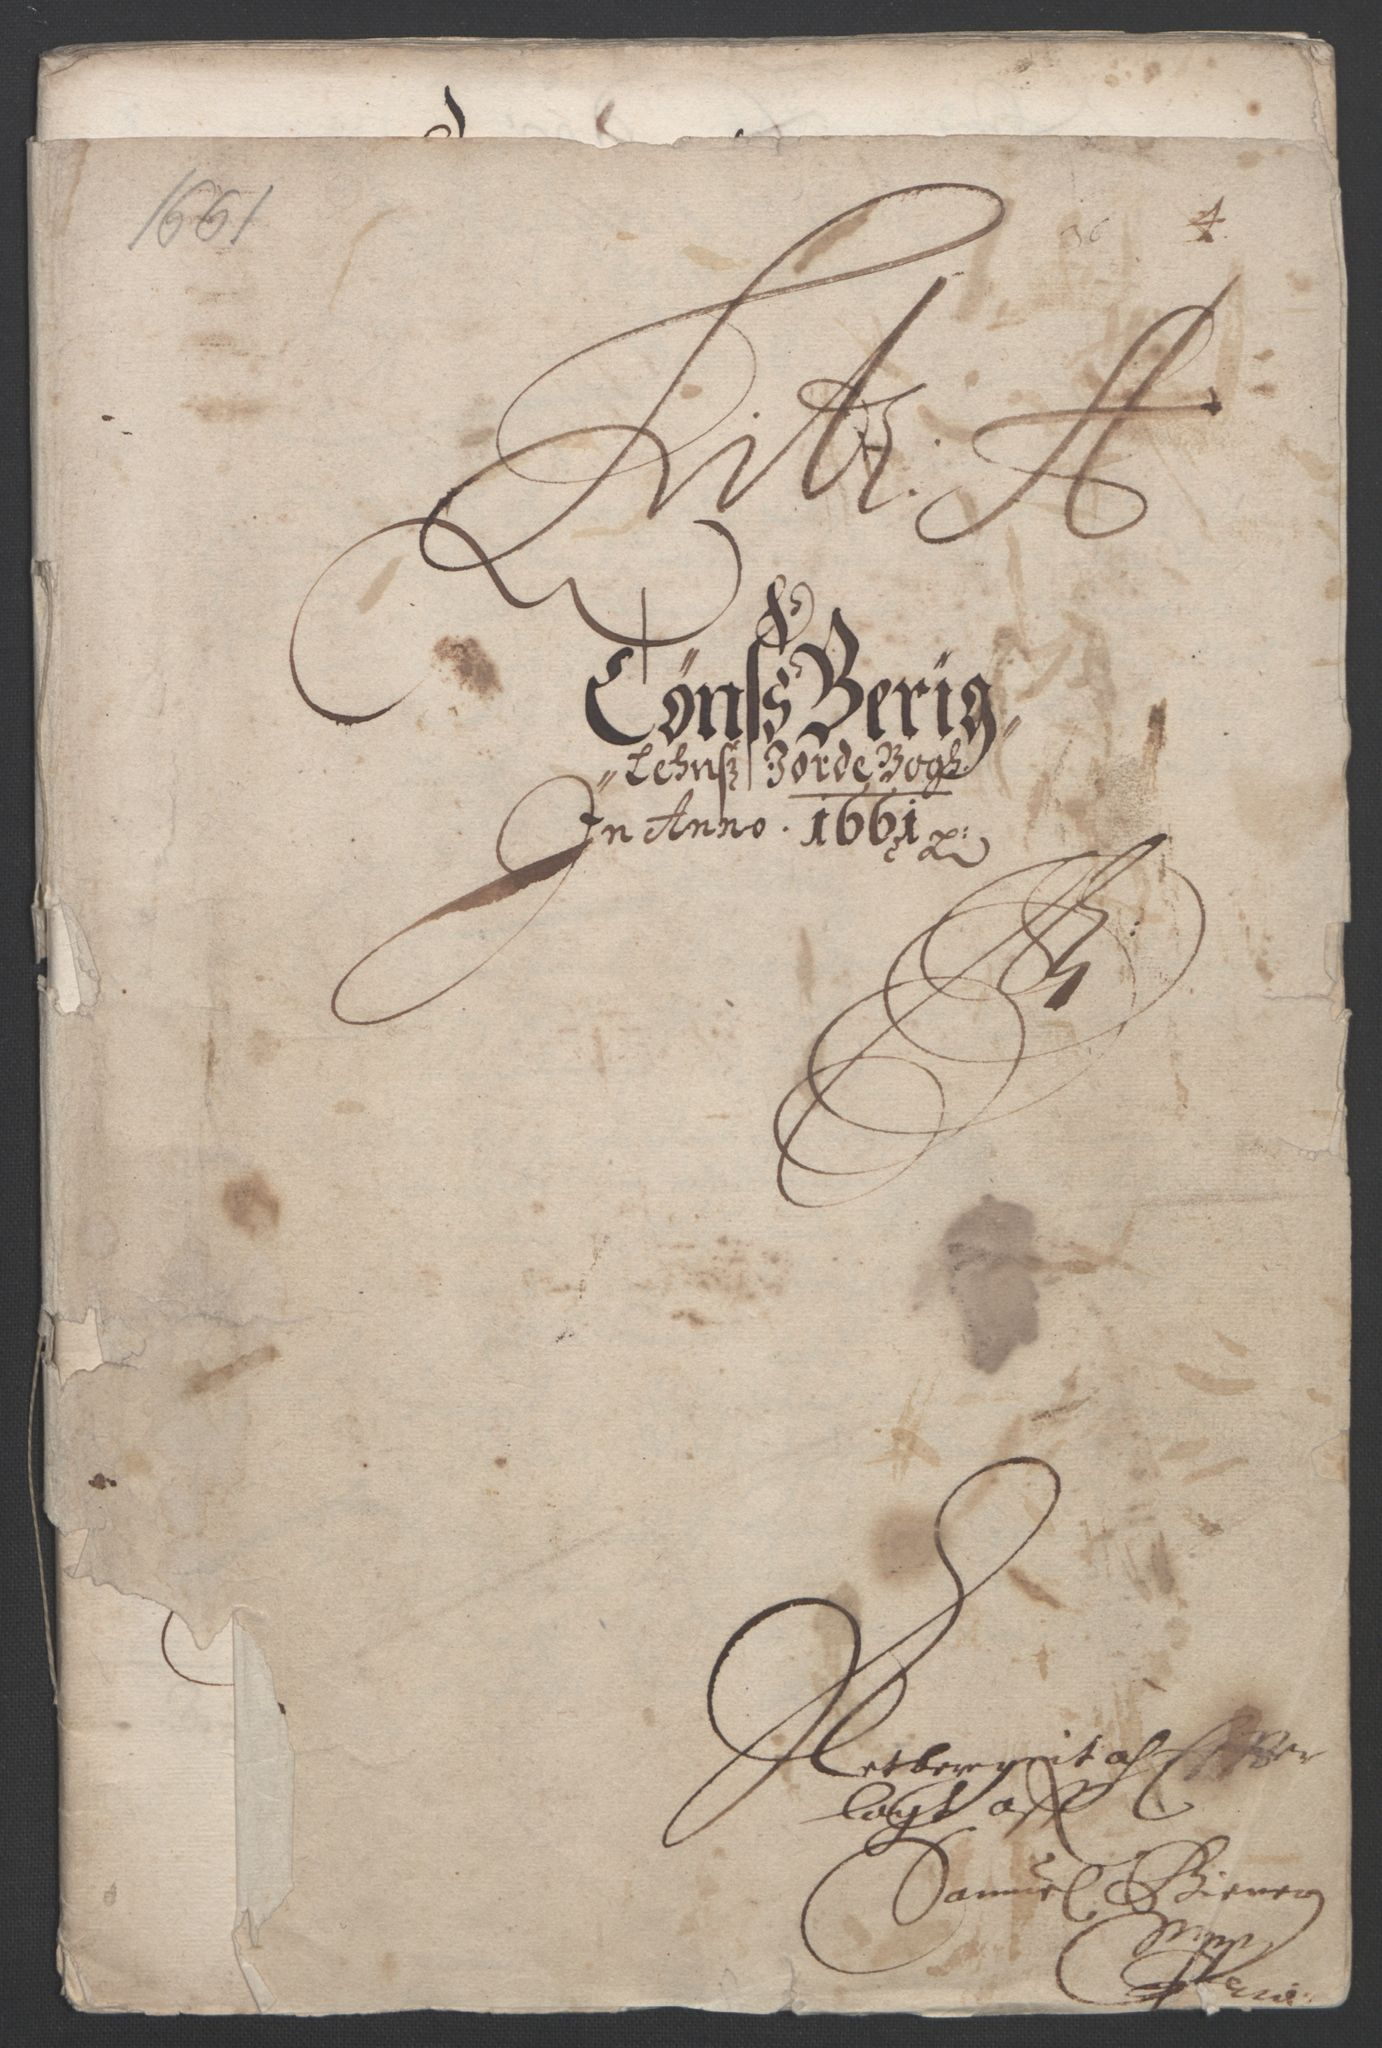 RA, Rentekammeret inntil 1814, Reviderte regnskaper, Fogderegnskap, R32/L1838: Fogderegnskap Jarlsberg grevskap, 1661-1663, s. 11